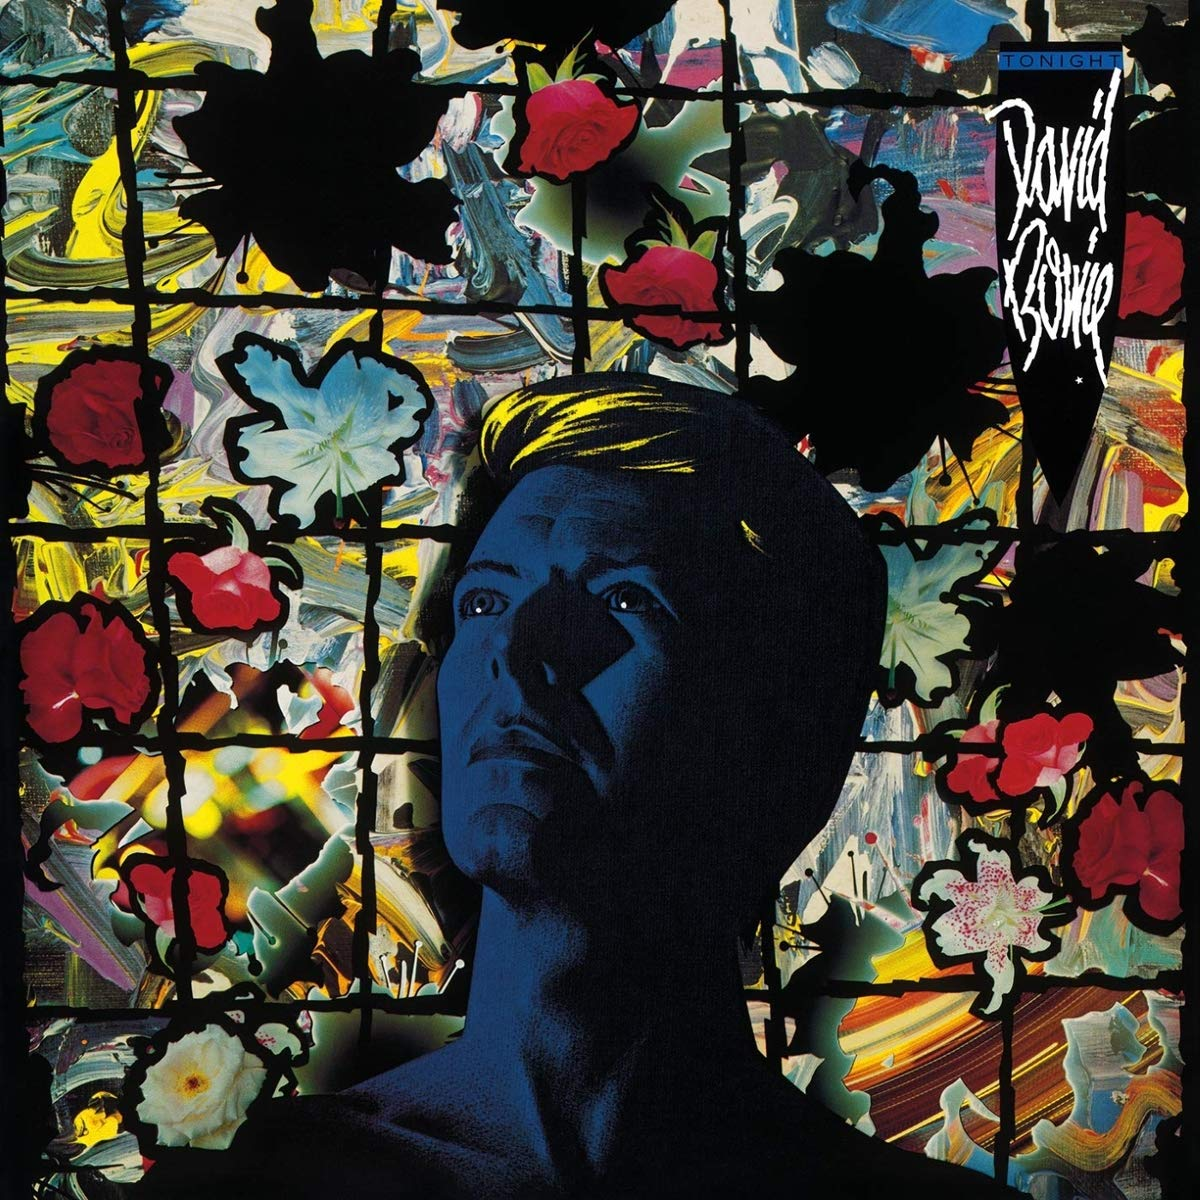 Vinilo : David Bowie - Tonight (2018 Remastered Version) (LP Vinyl)